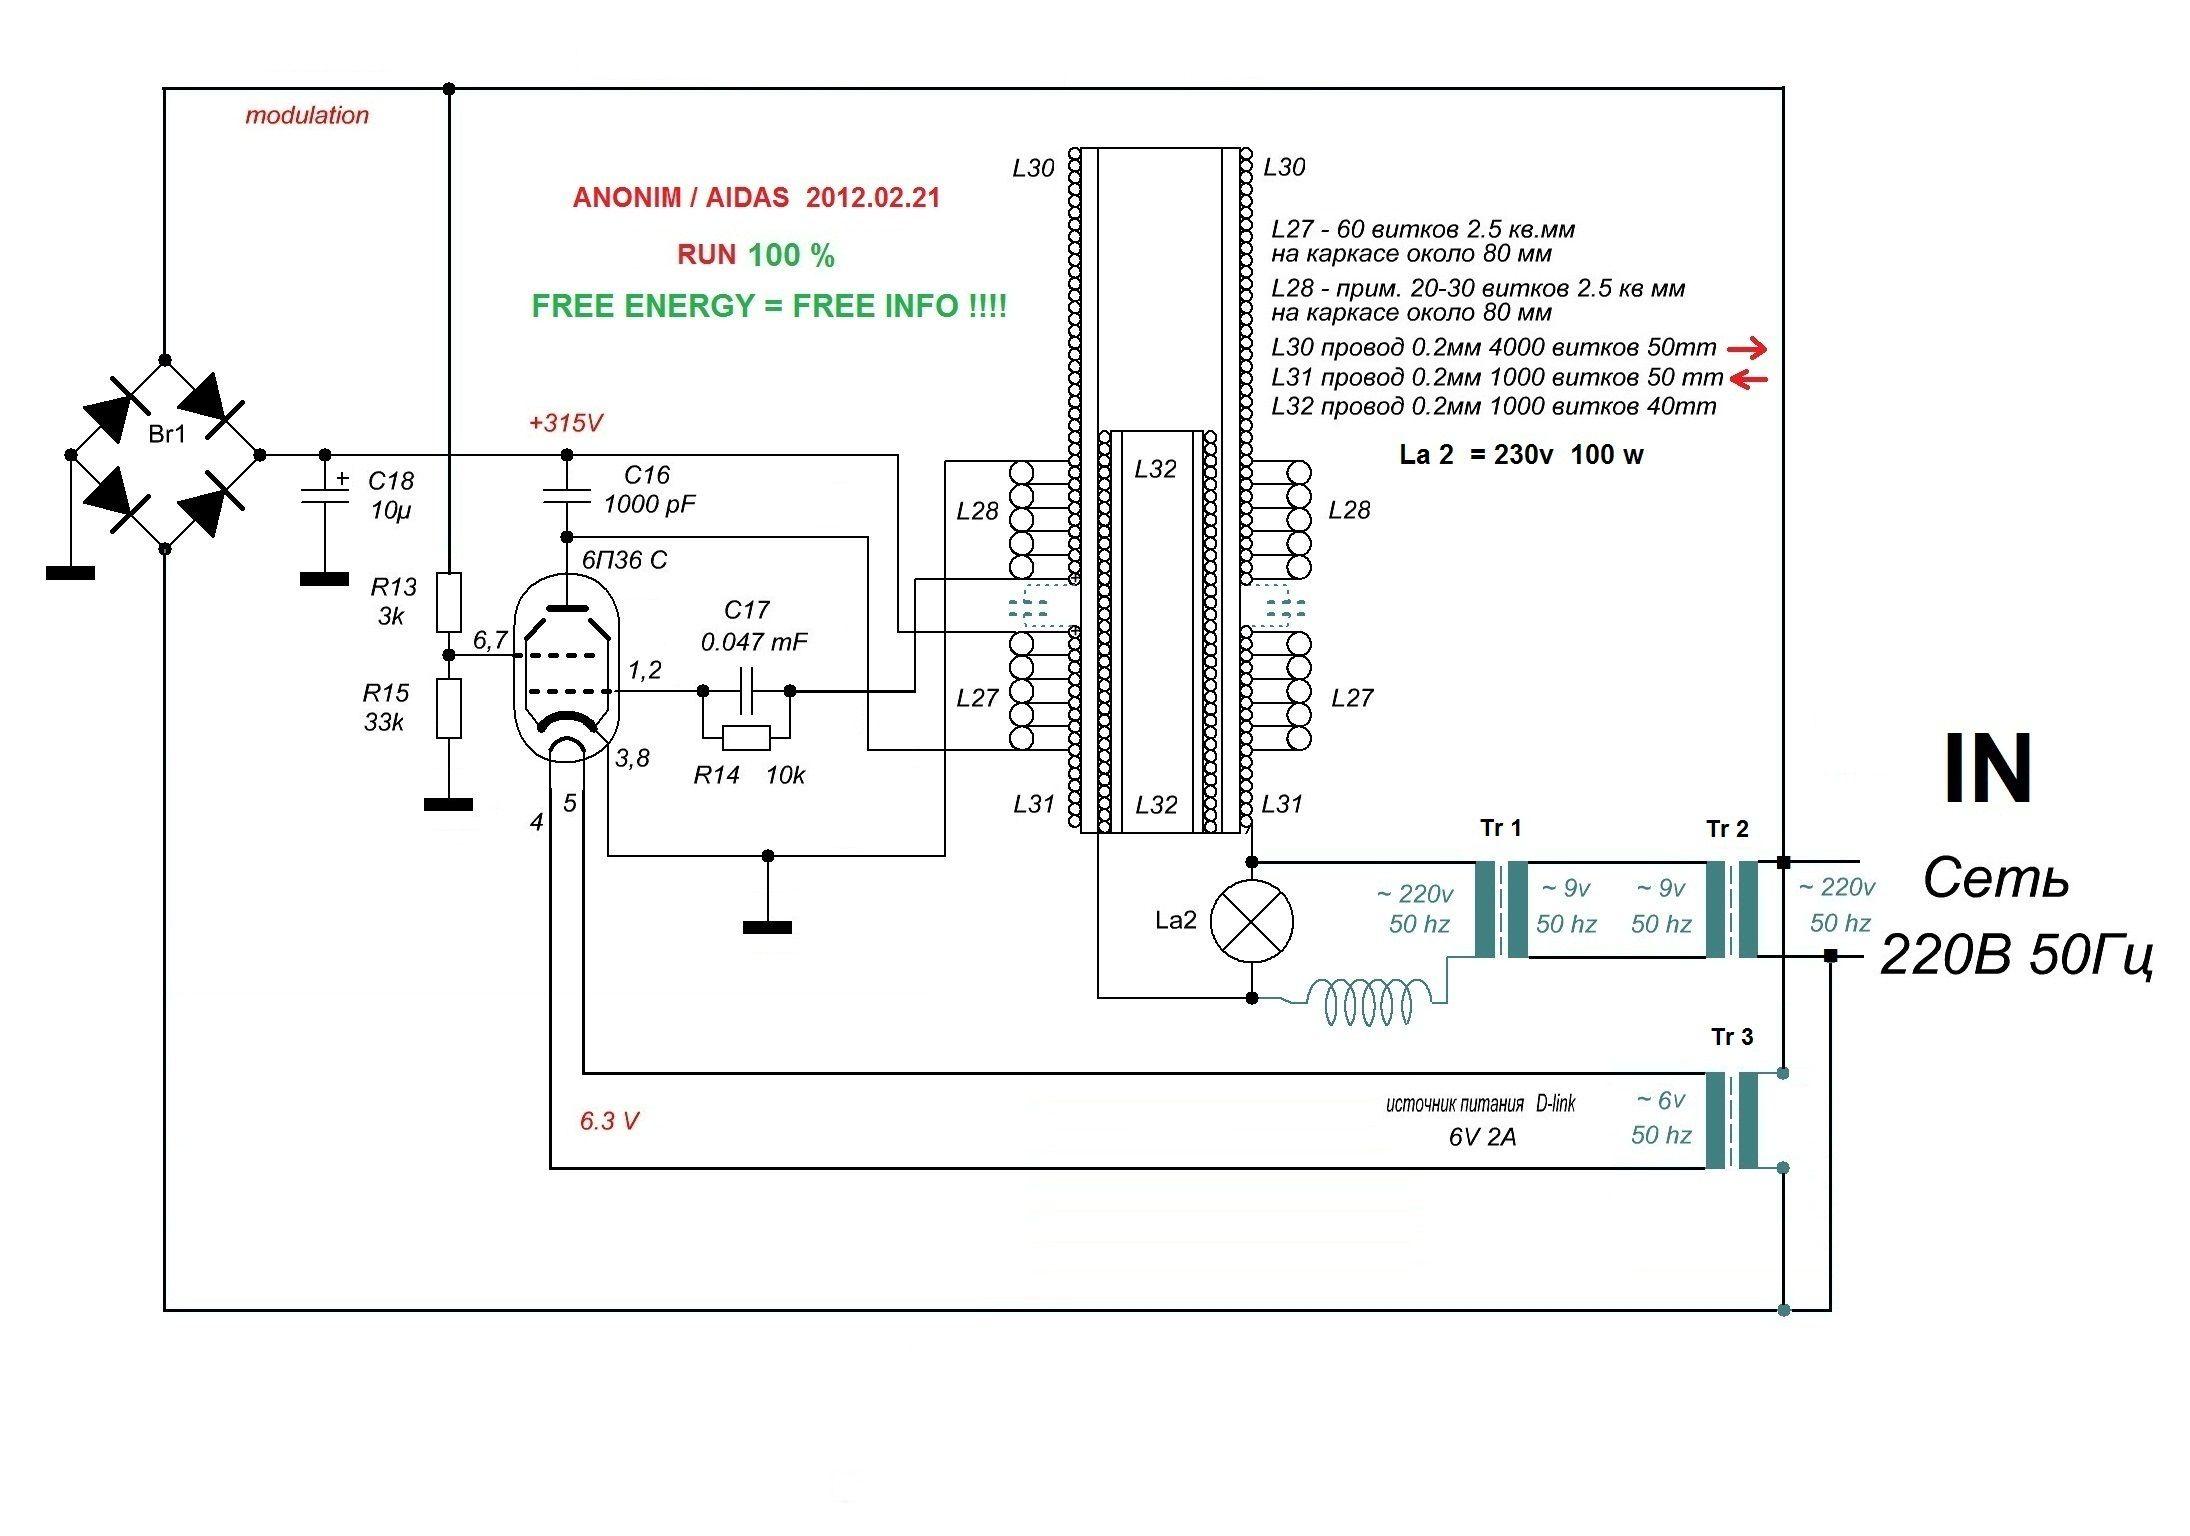 re selfrunning free energy devices up to 5 kw from tariel kapanadze free energy kapanadze free energy generator schematics [ 2190 x 1536 Pixel ]